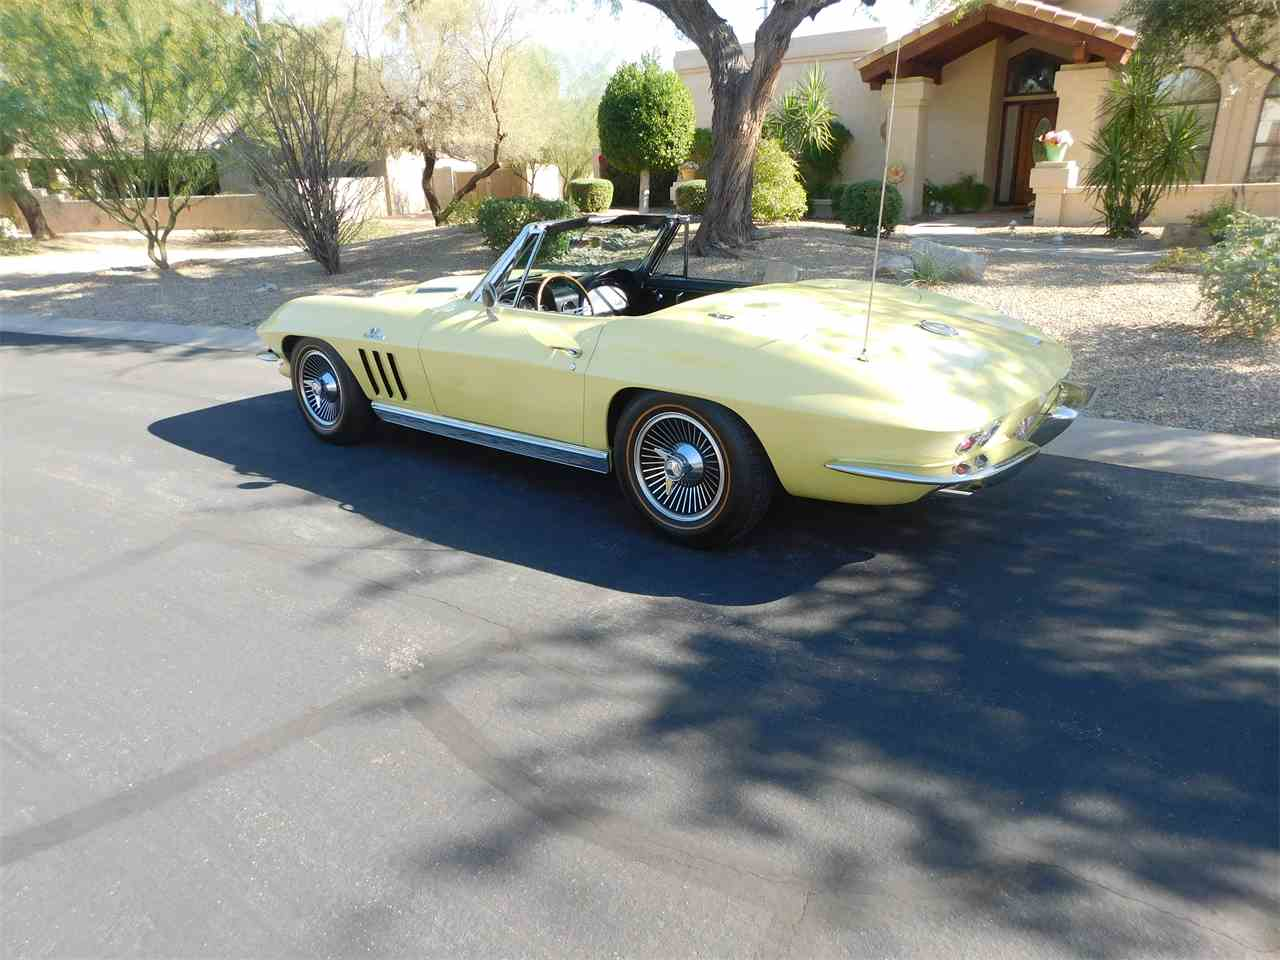 Large Picture of 1966 Corvette located in Arizona - $87,965.00 - M81X